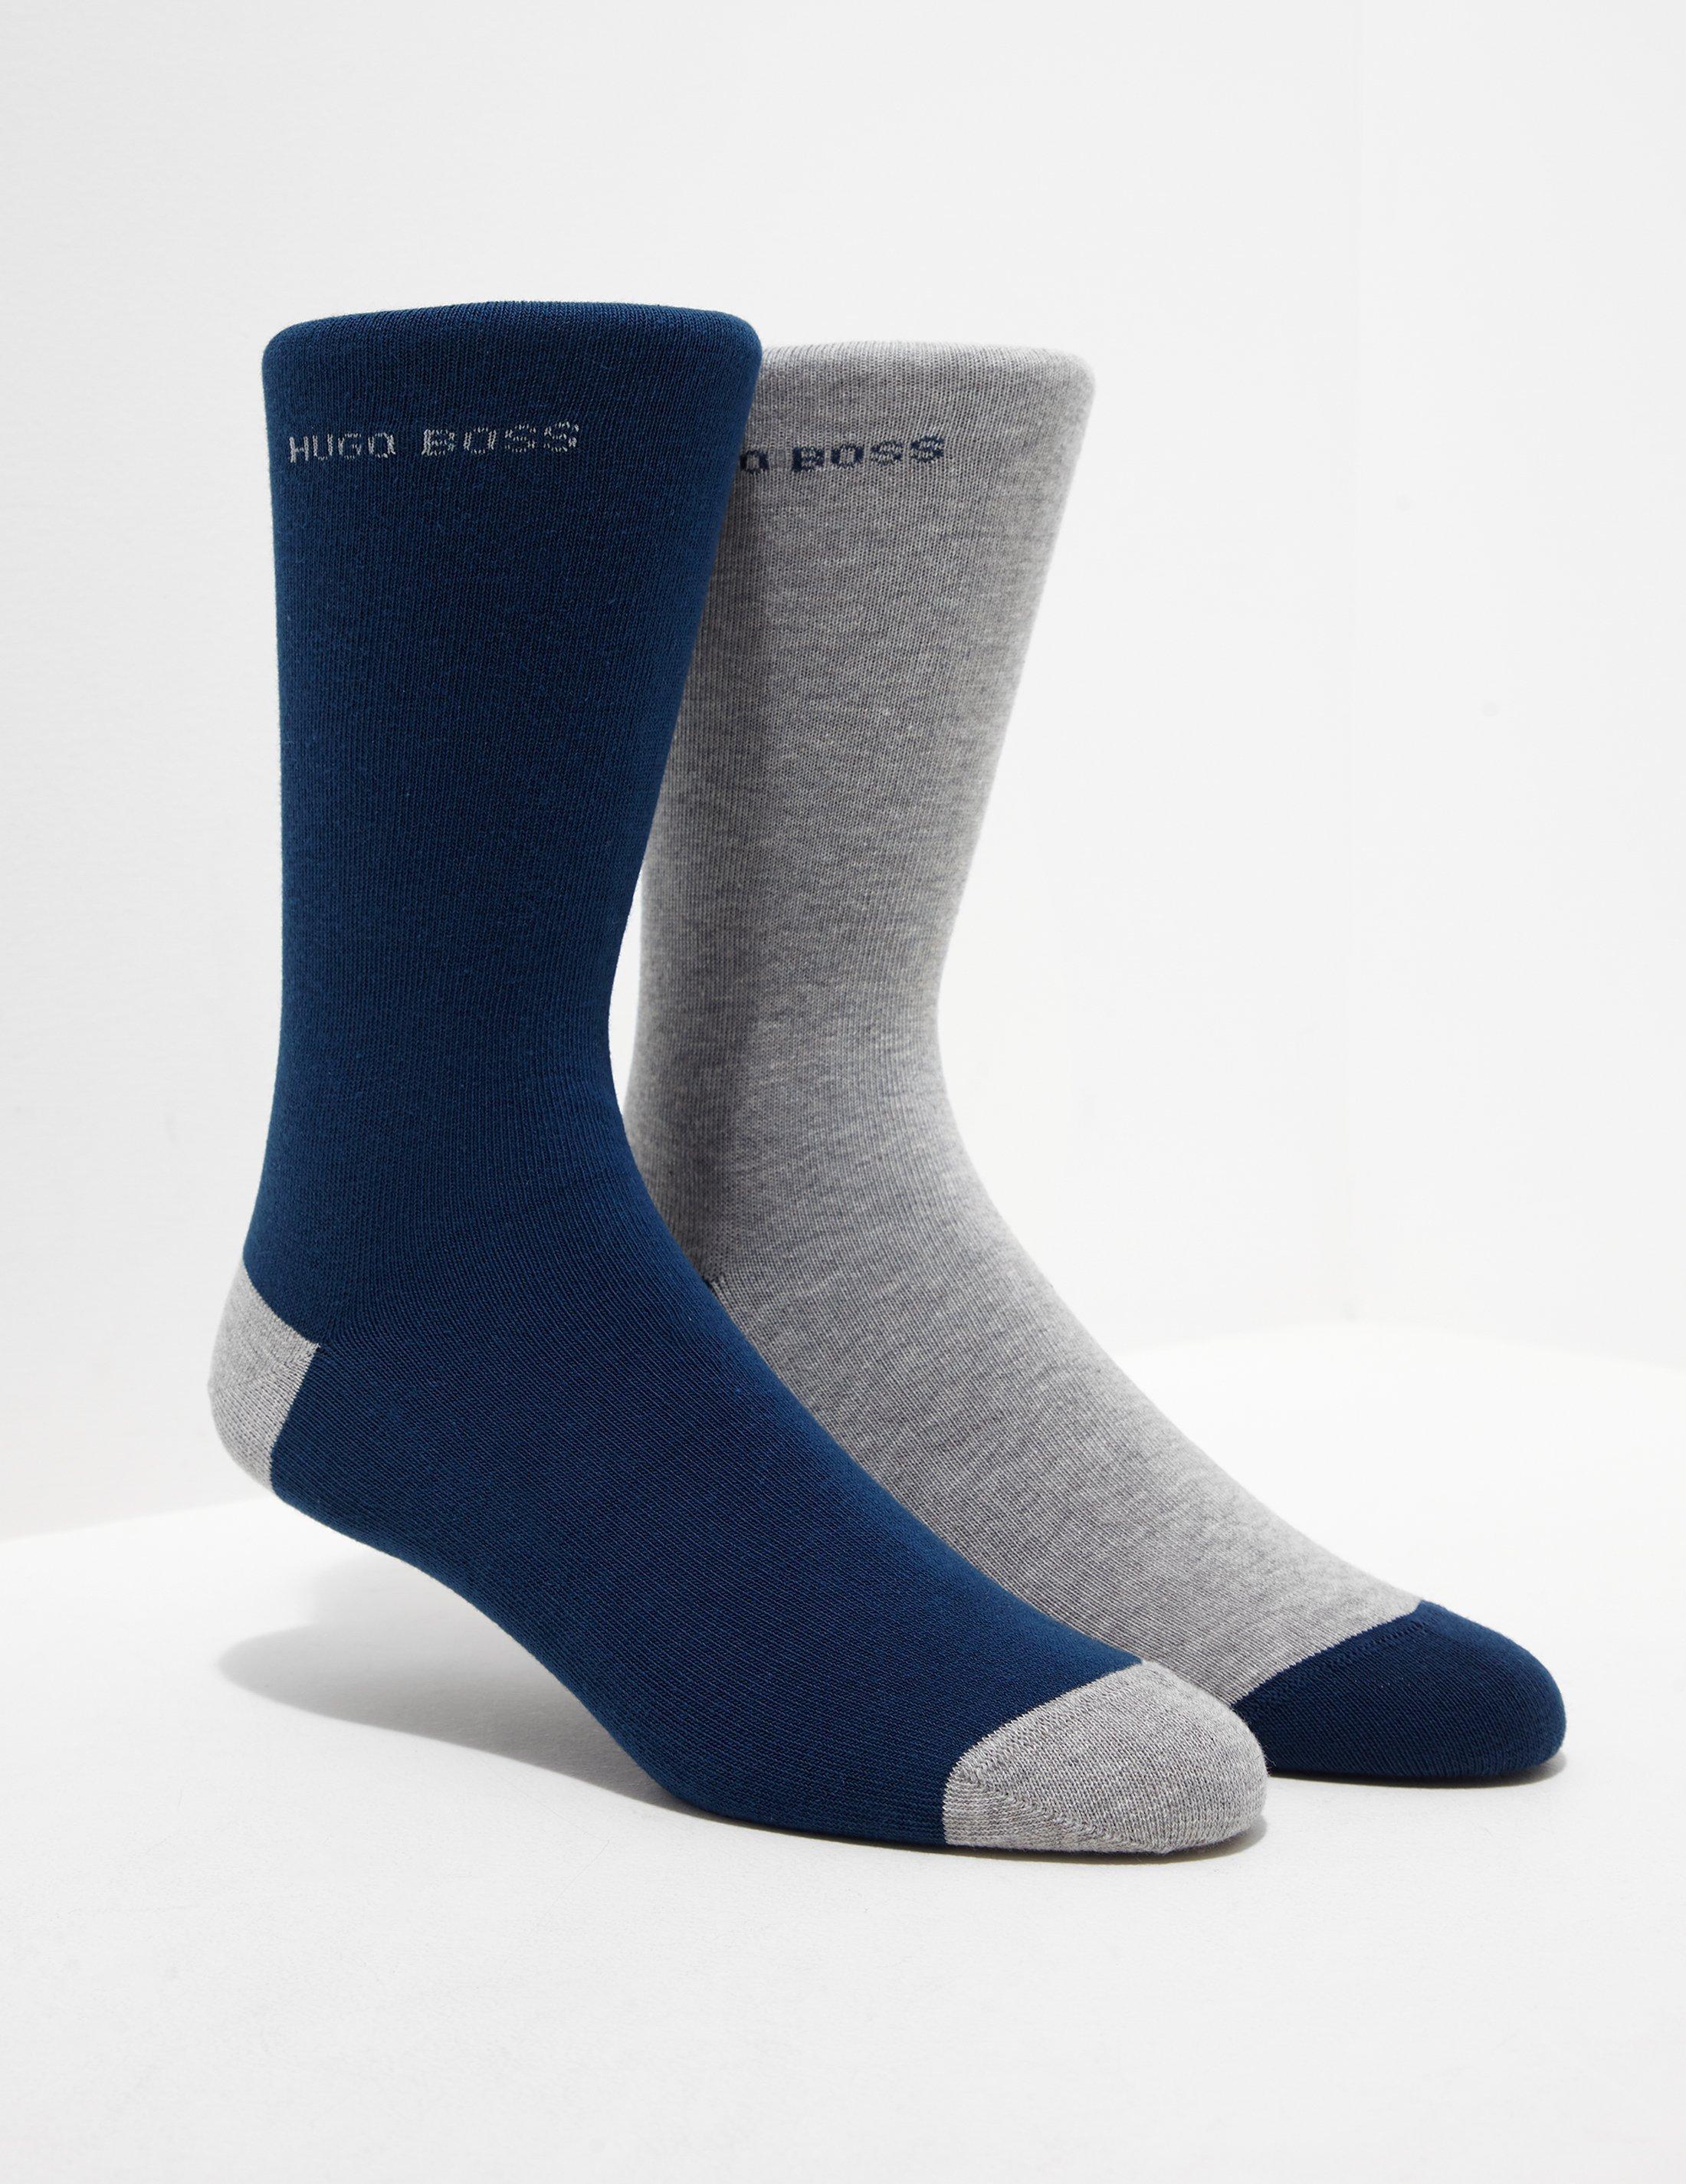 Polo Ralph Lauren Core Trunks (3 Pack) Mens Socks Shop Mens Socks COLOUR-blues